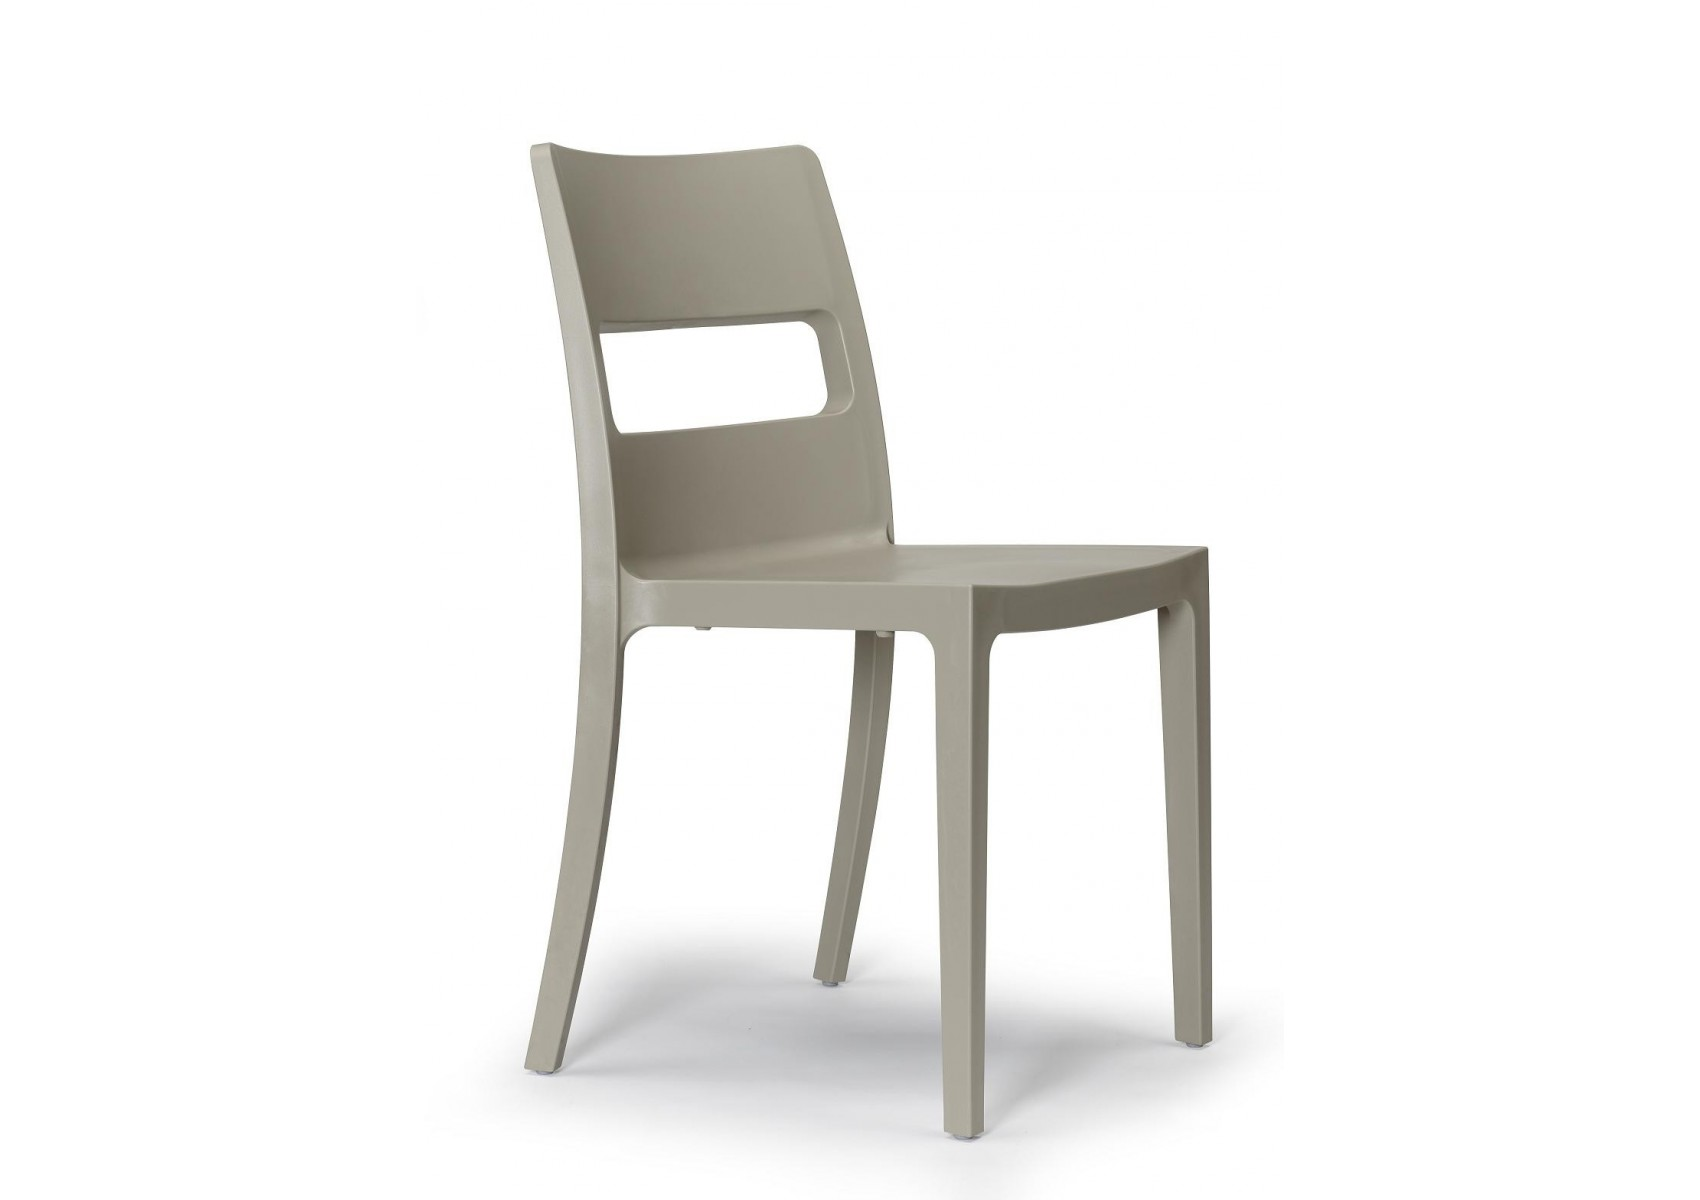 chaise design de jardin sai scab design. Black Bedroom Furniture Sets. Home Design Ideas